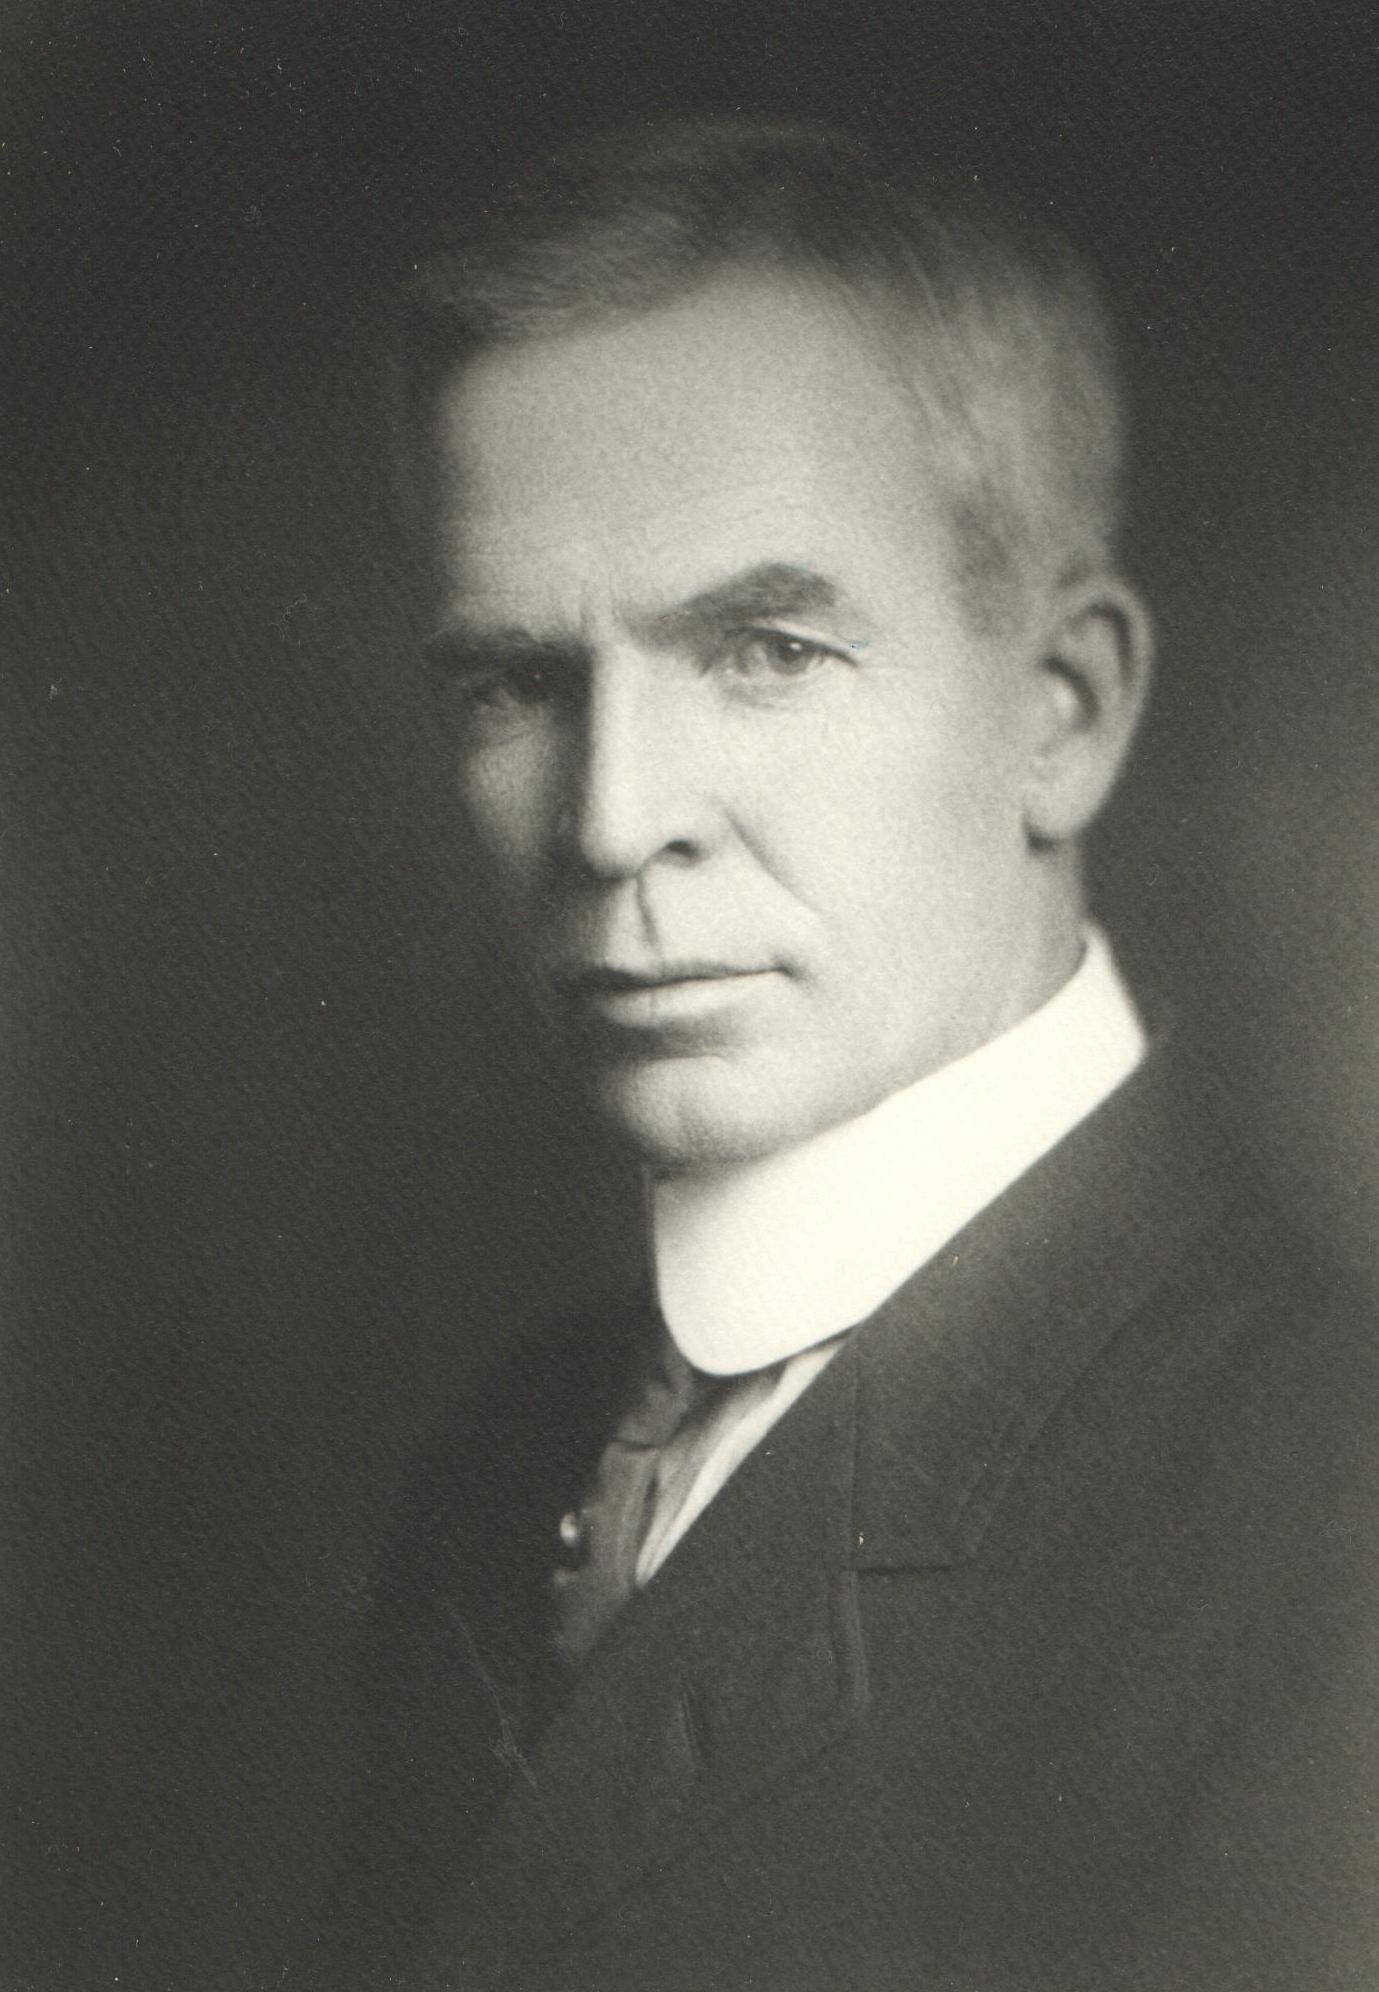 1908 J. C. Poole